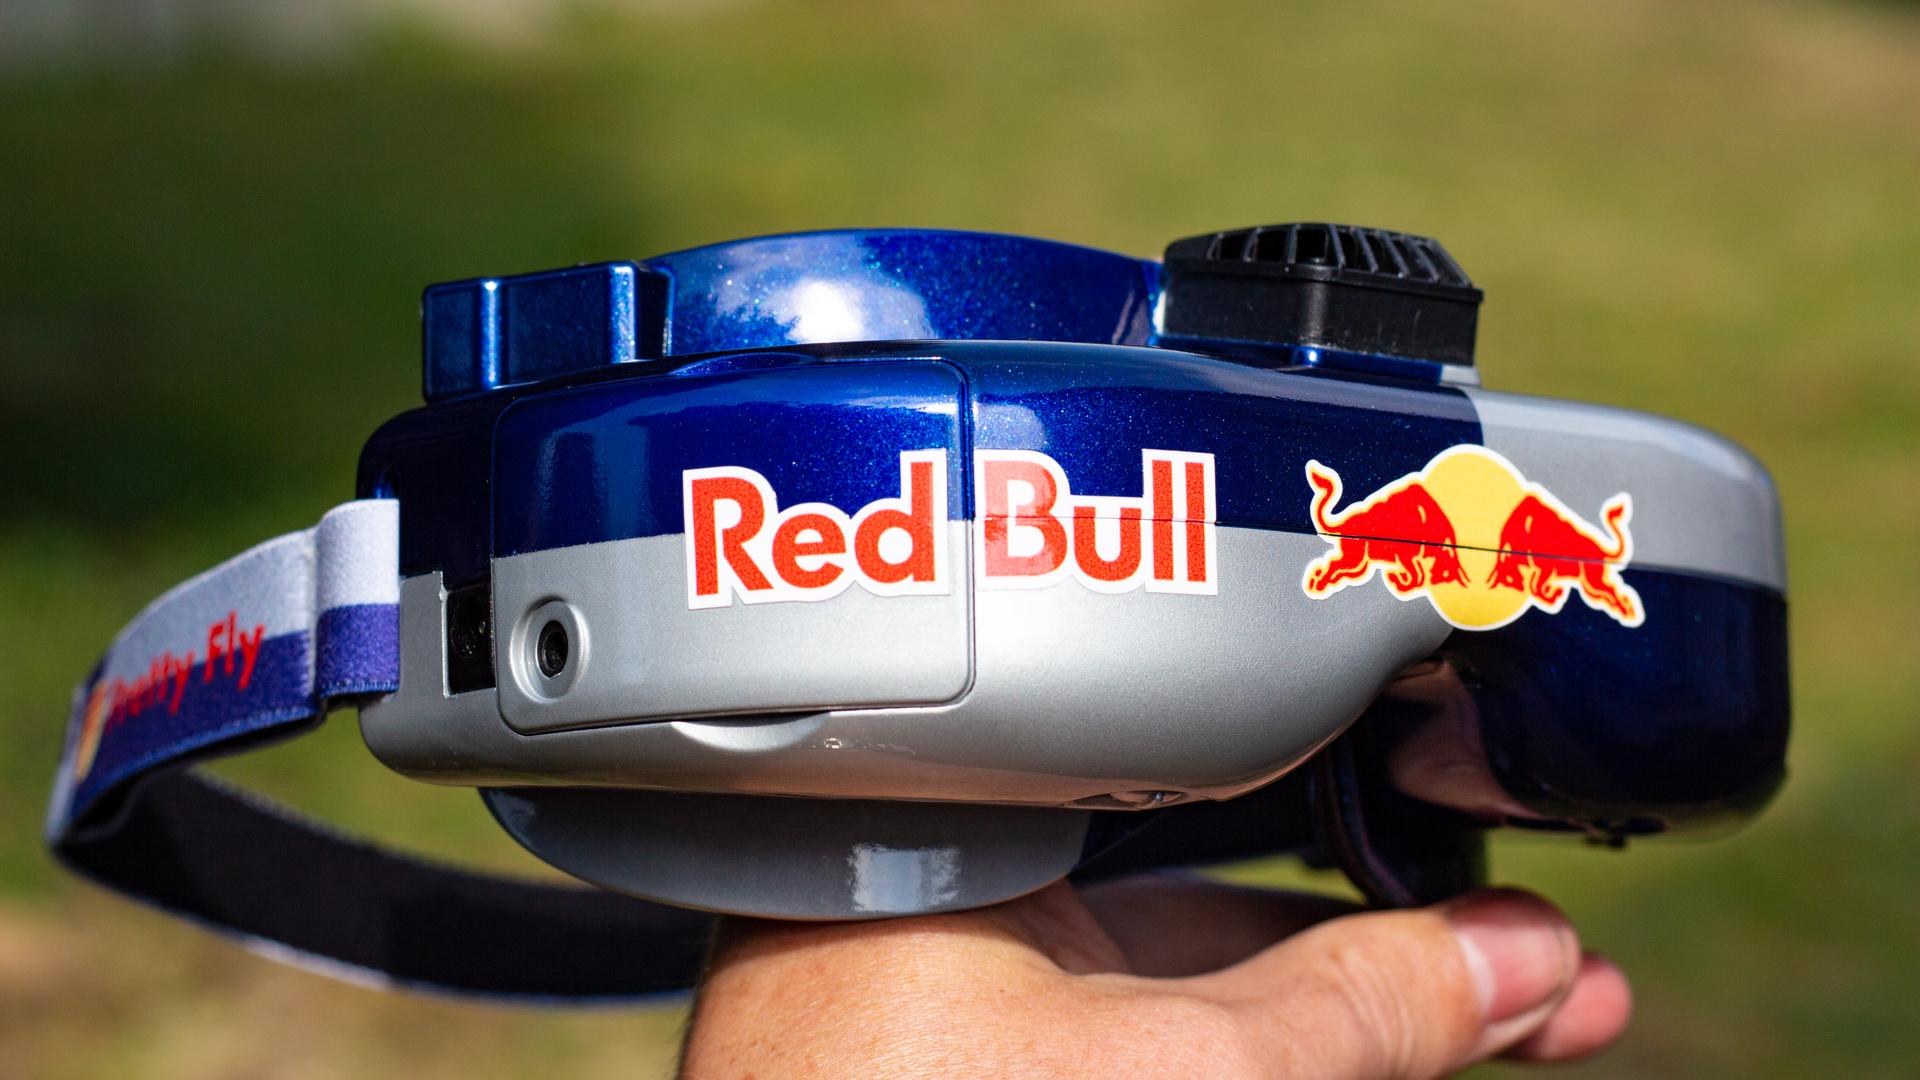 custom fatshark fpv goggles held in hand